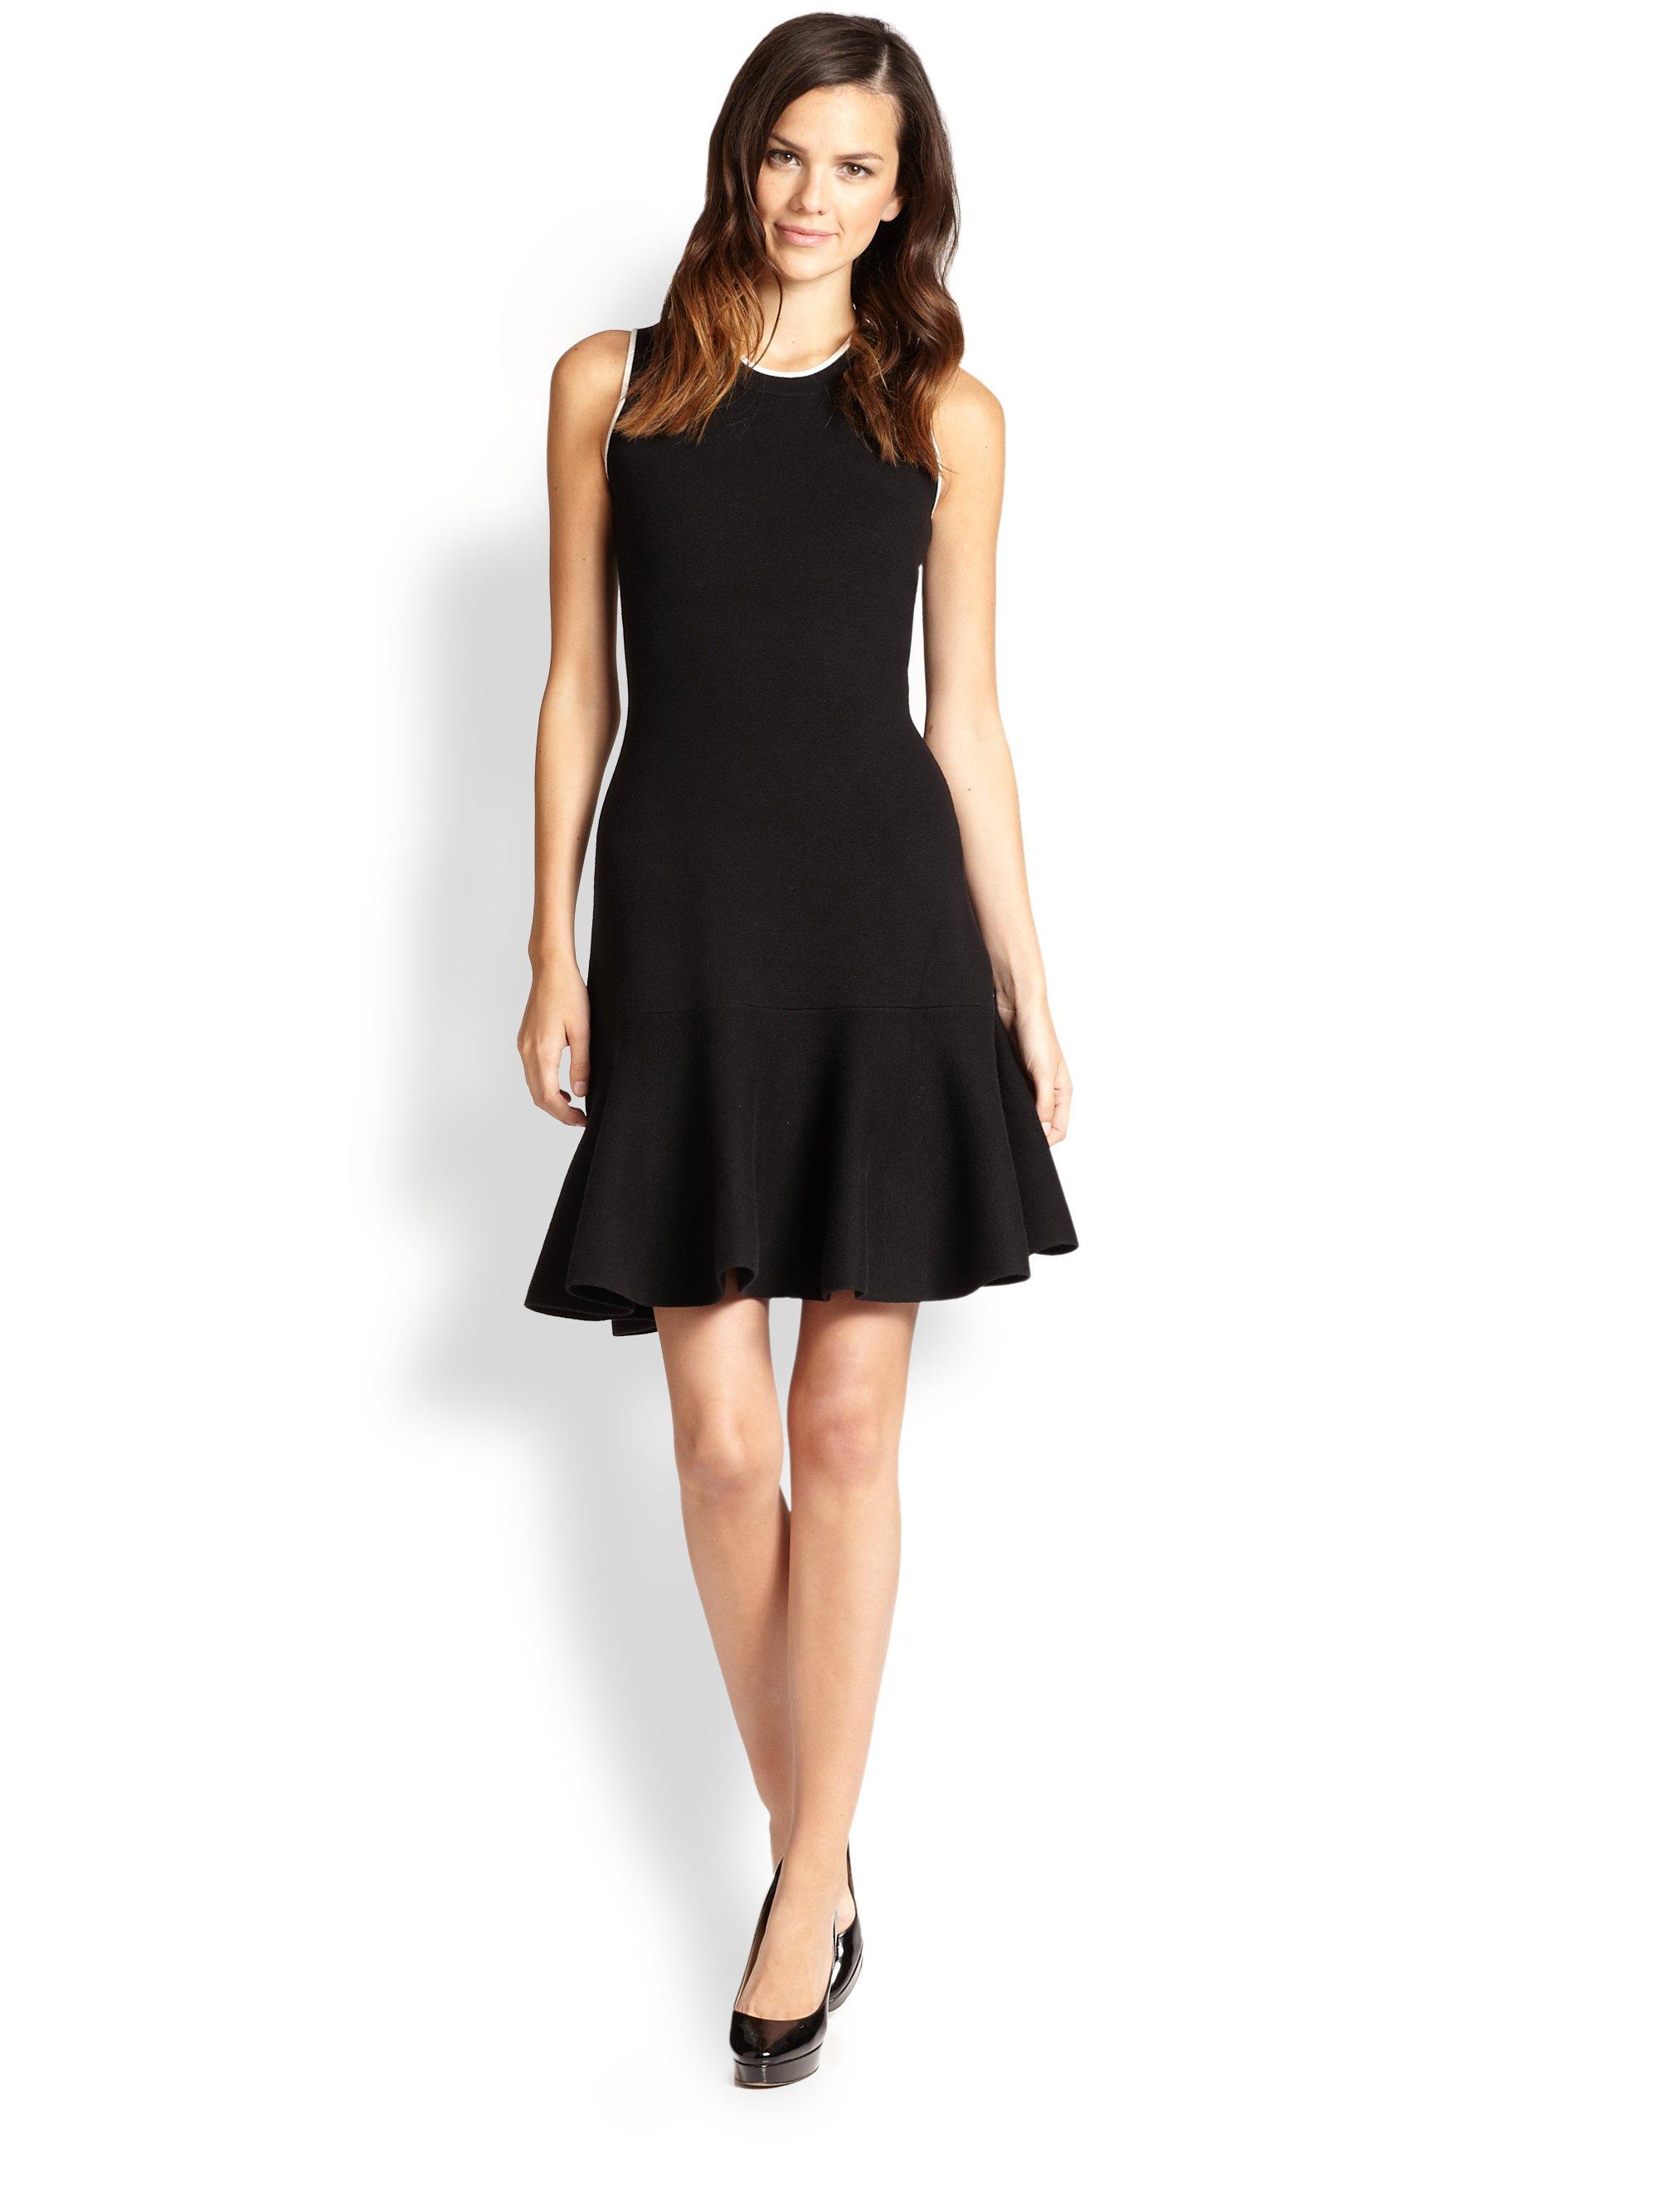 Black Dress Kate Spade